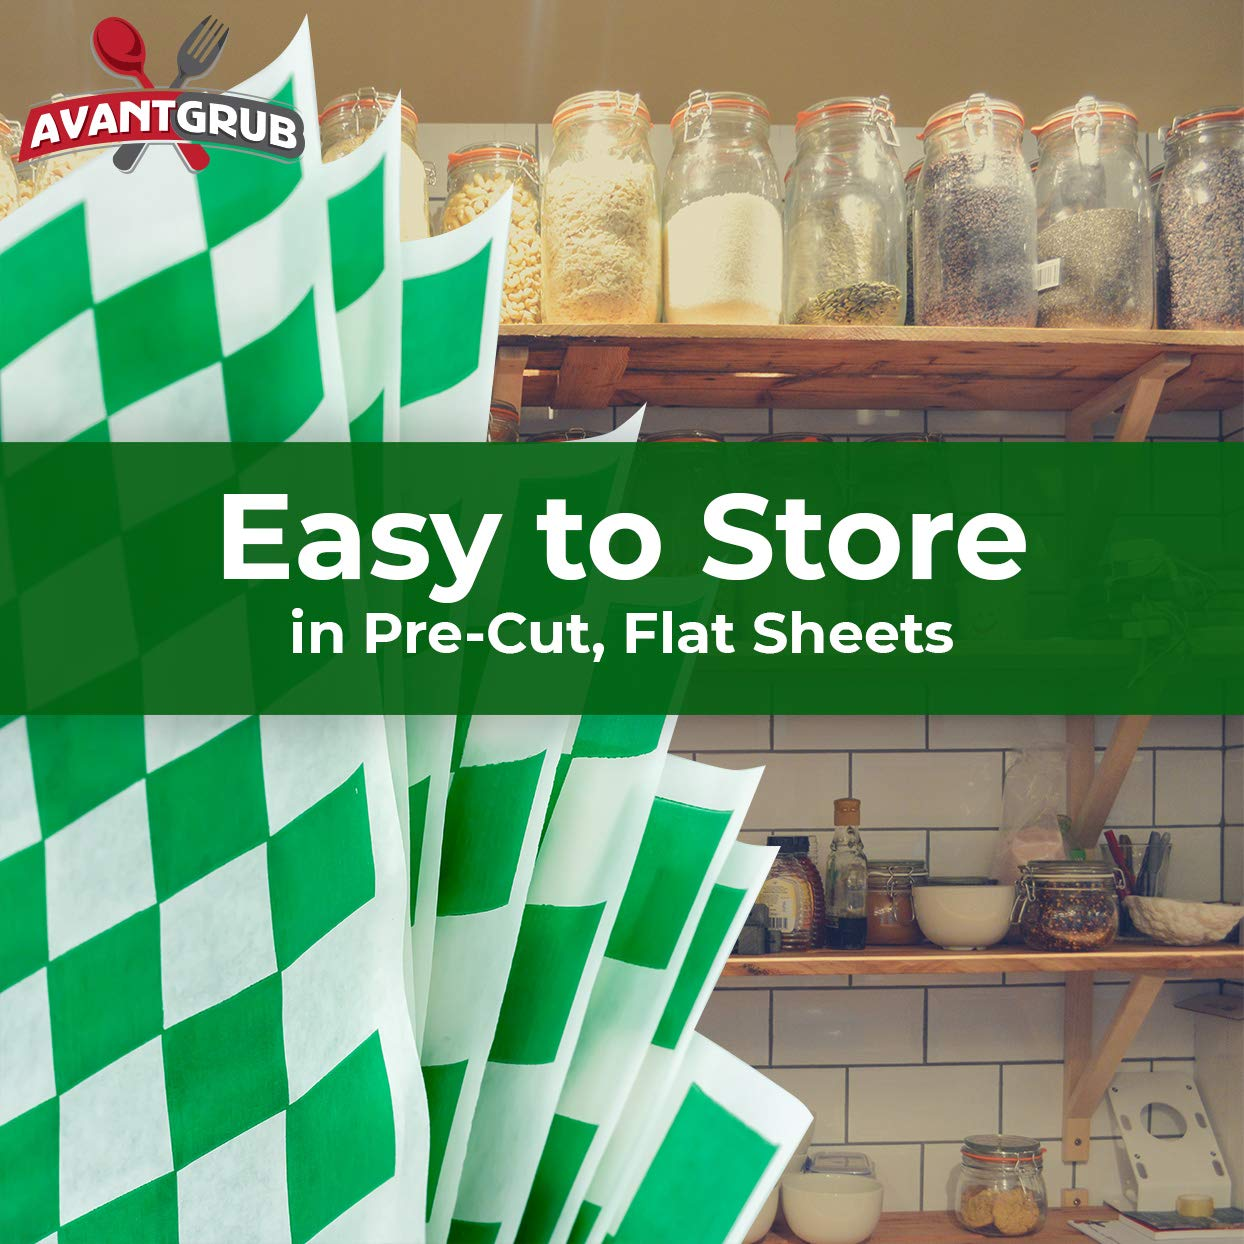 miniature 32 - [300 Pack] Retro Deli Sandwich Liner 15x15 Wax Patty Paper Sheets by Avant Grub